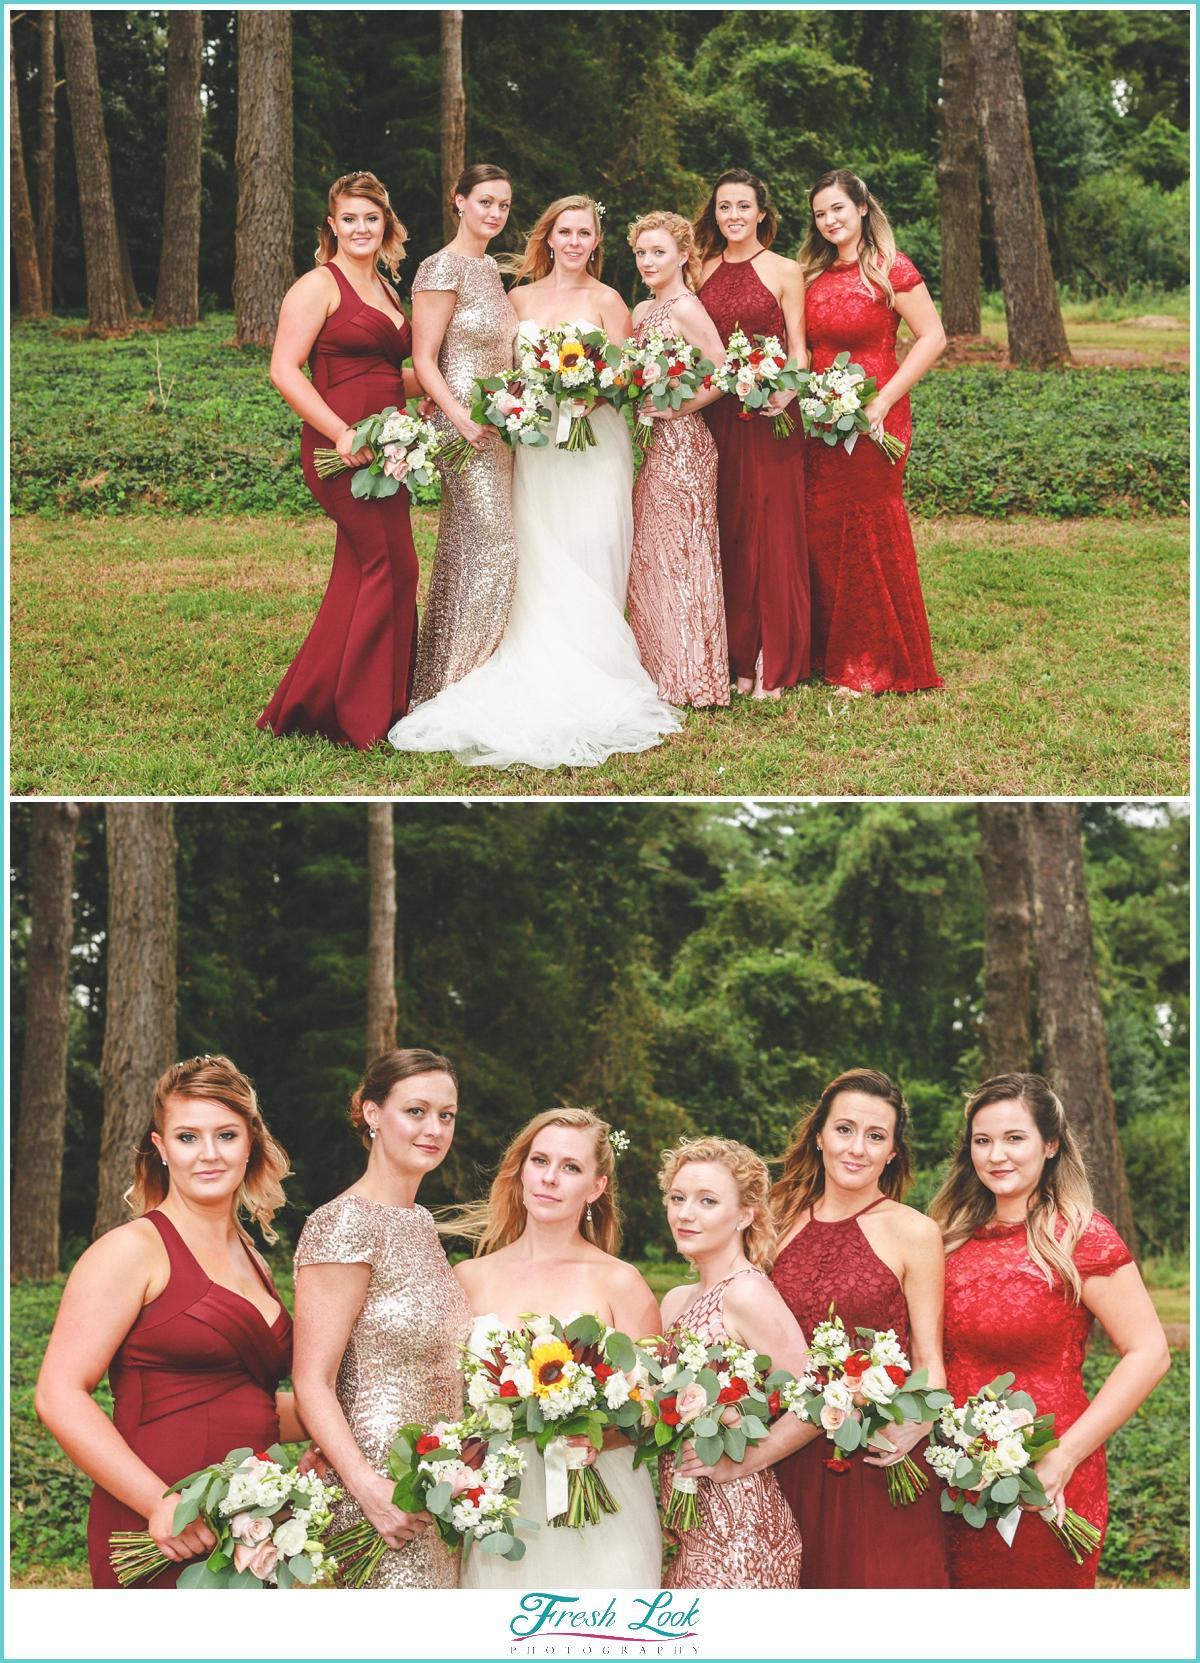 beautiful bridesmaids in red